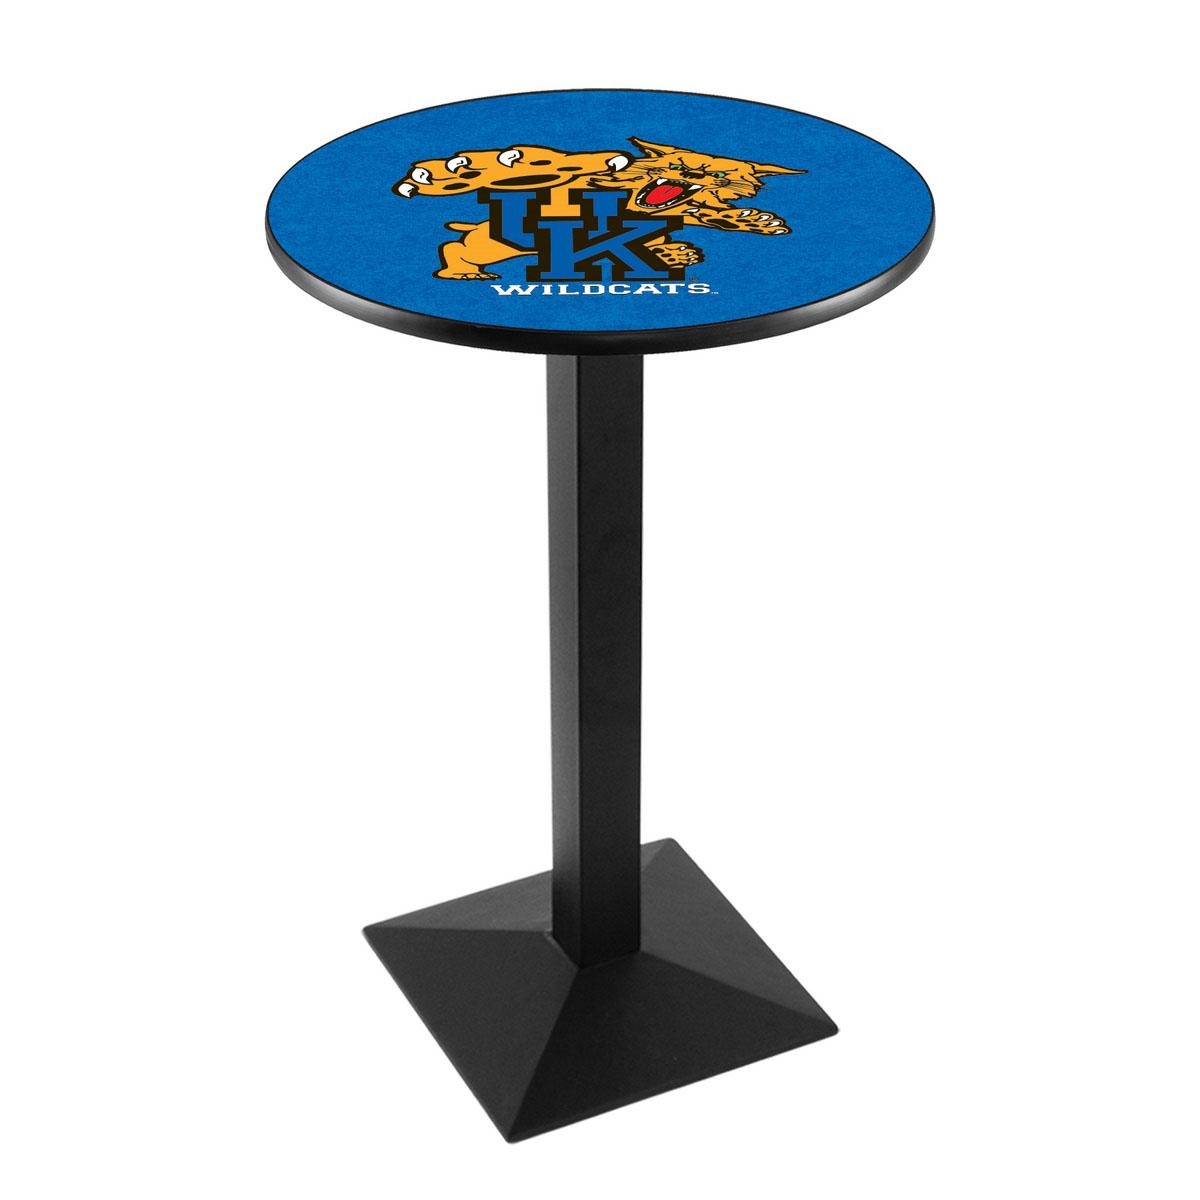 Superb University Kentucky Cat Logo Pub Bar Table Square Stand Product Photo